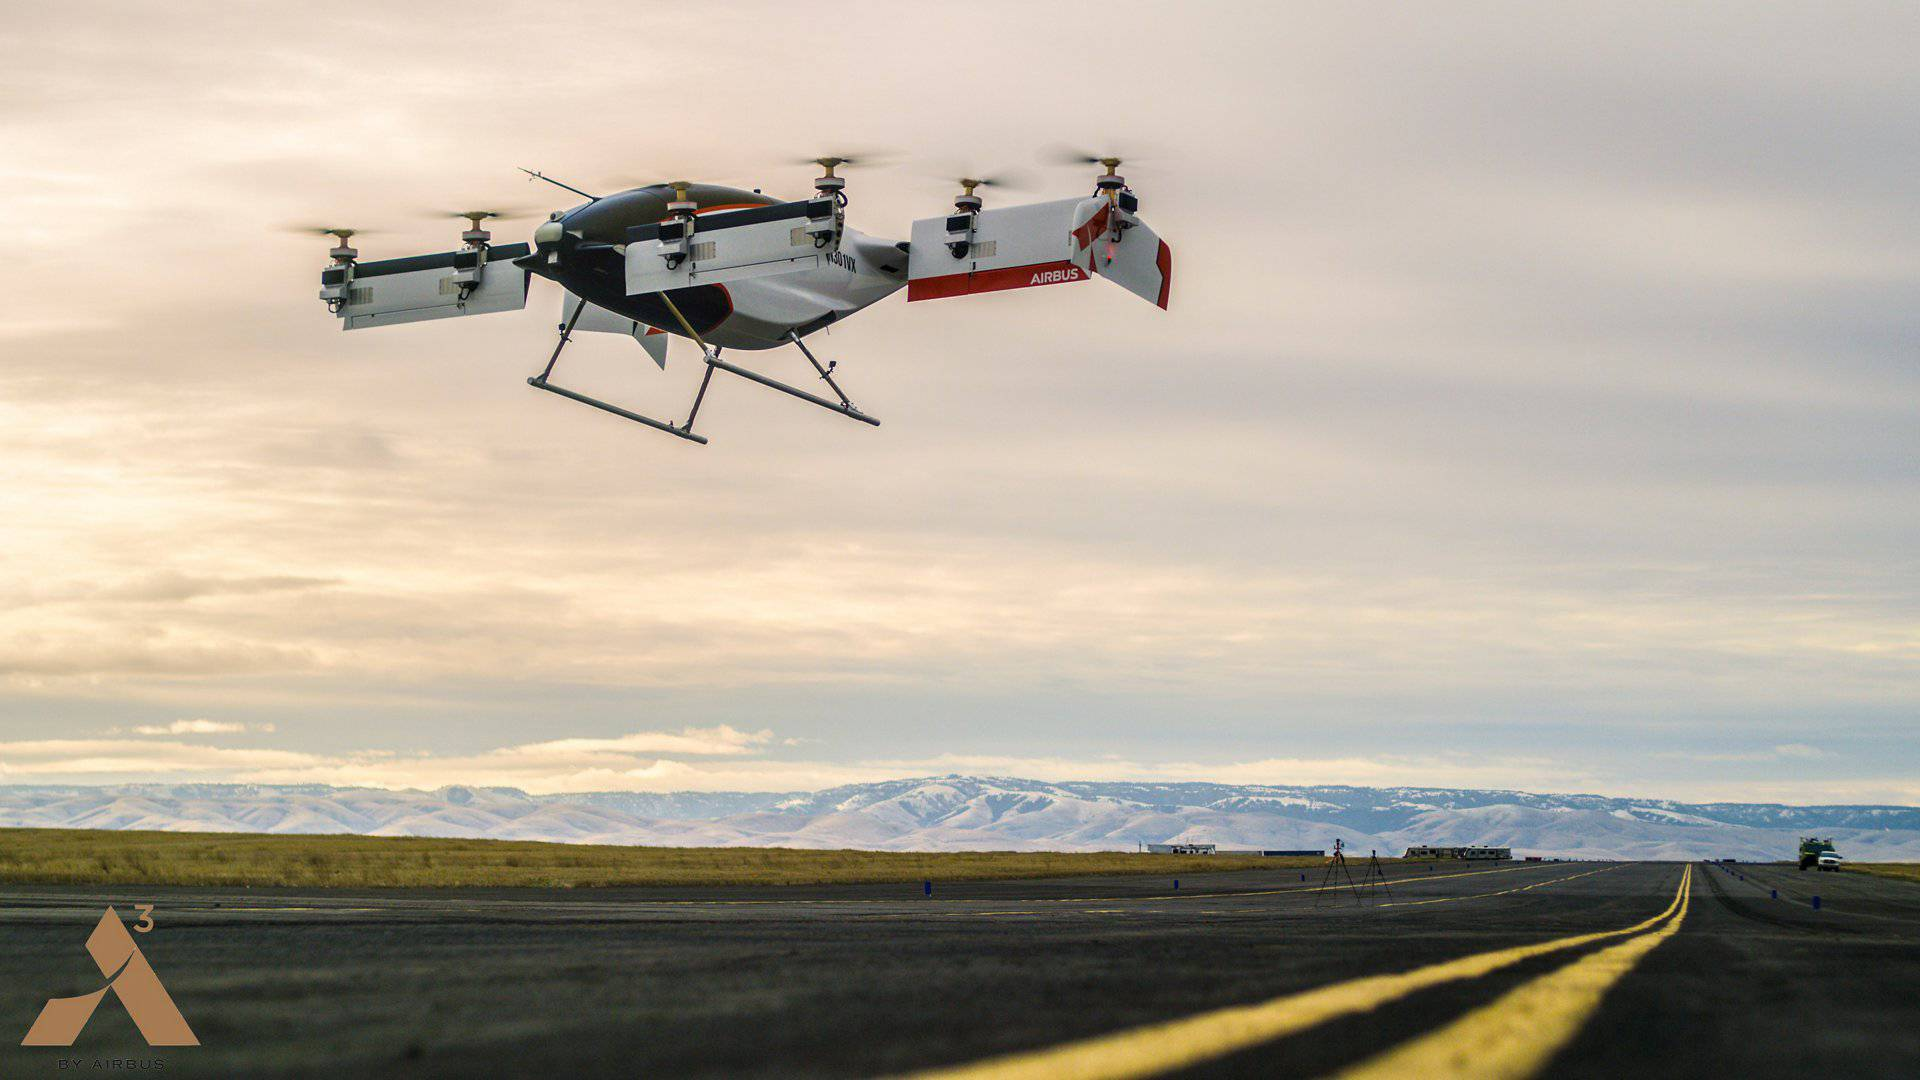 Revolucija sve bliža: Airbusov leteći taksi poletio je prvi put